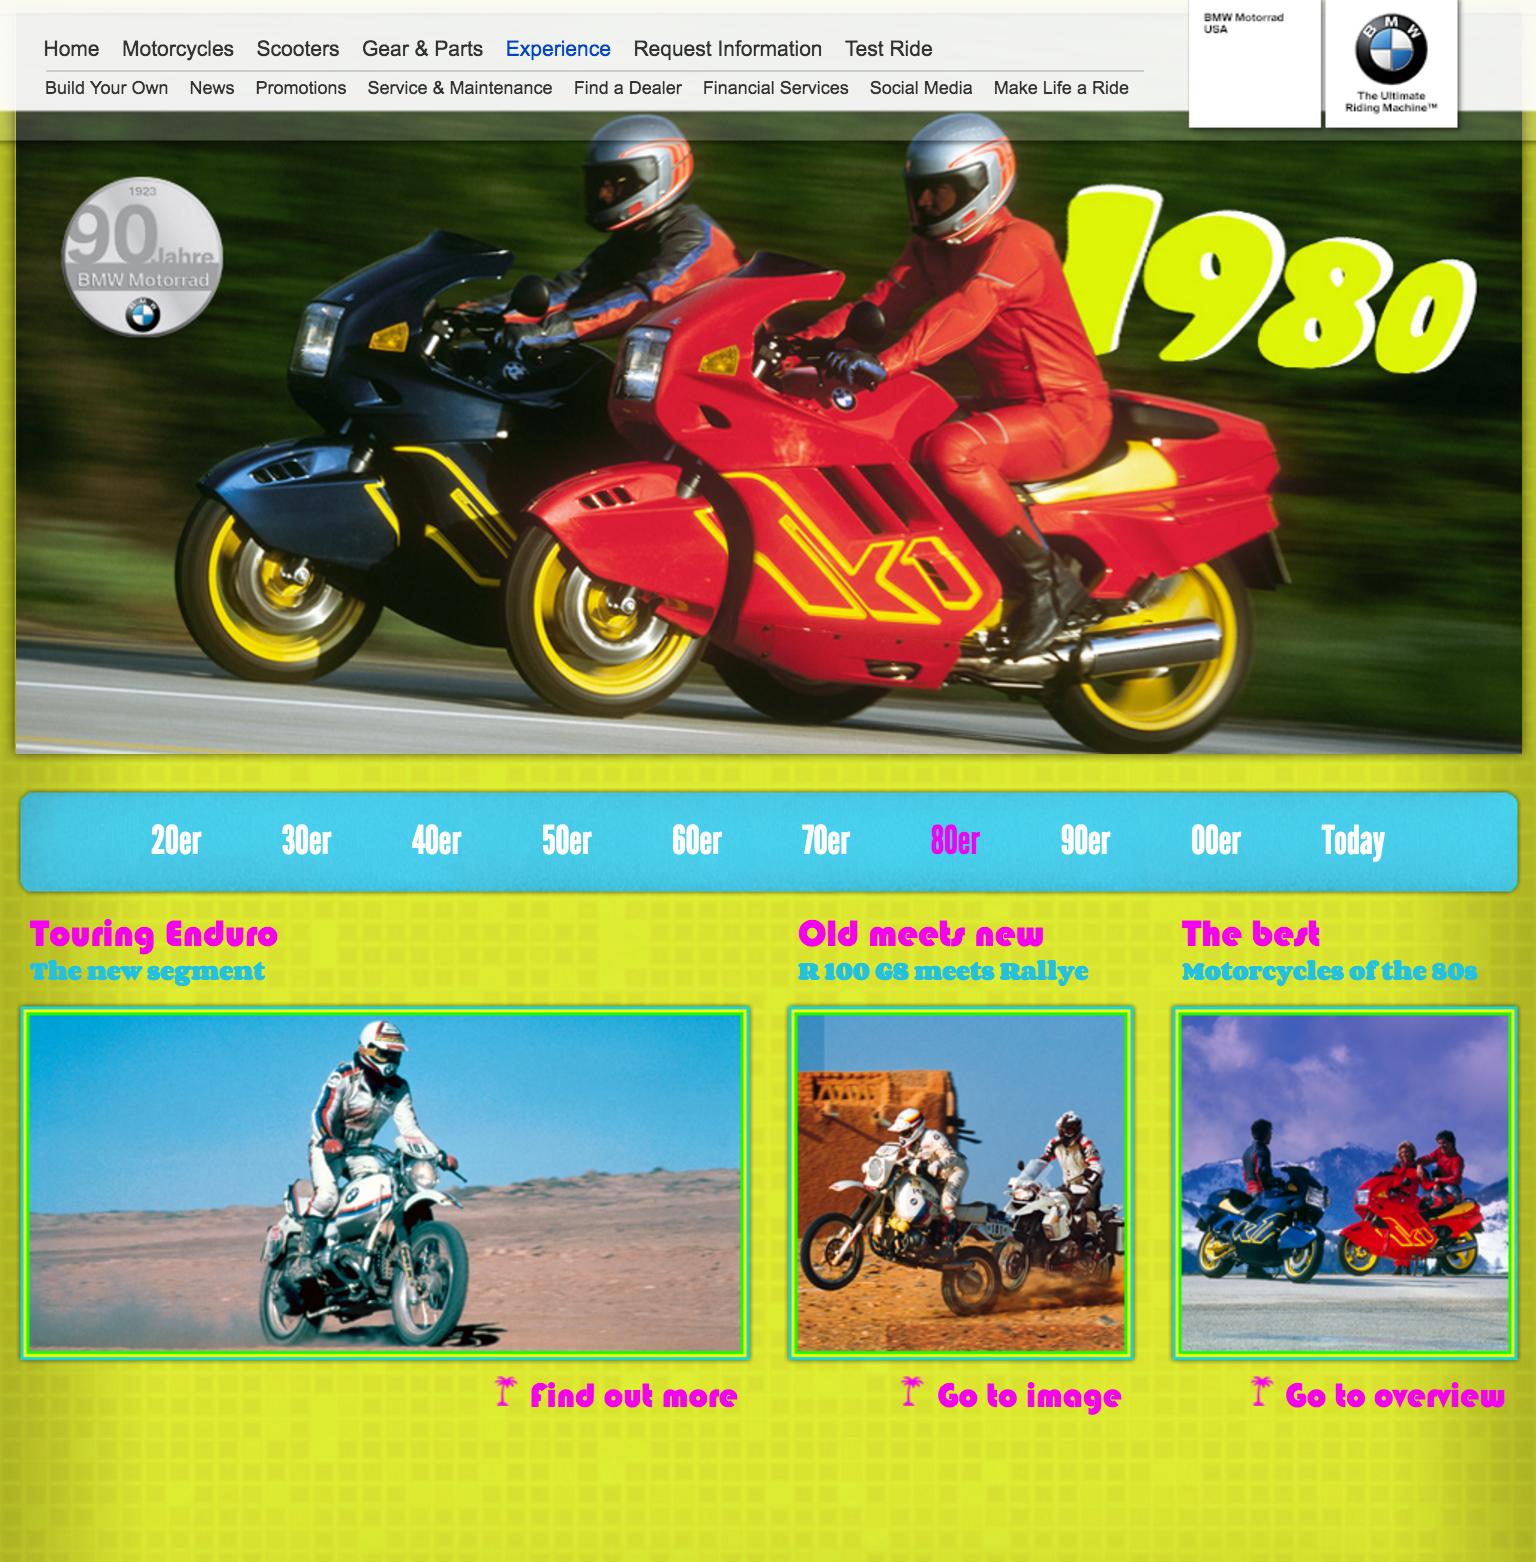 BMW MOTORRAD 90 YEARS OF MOTORCYCLES